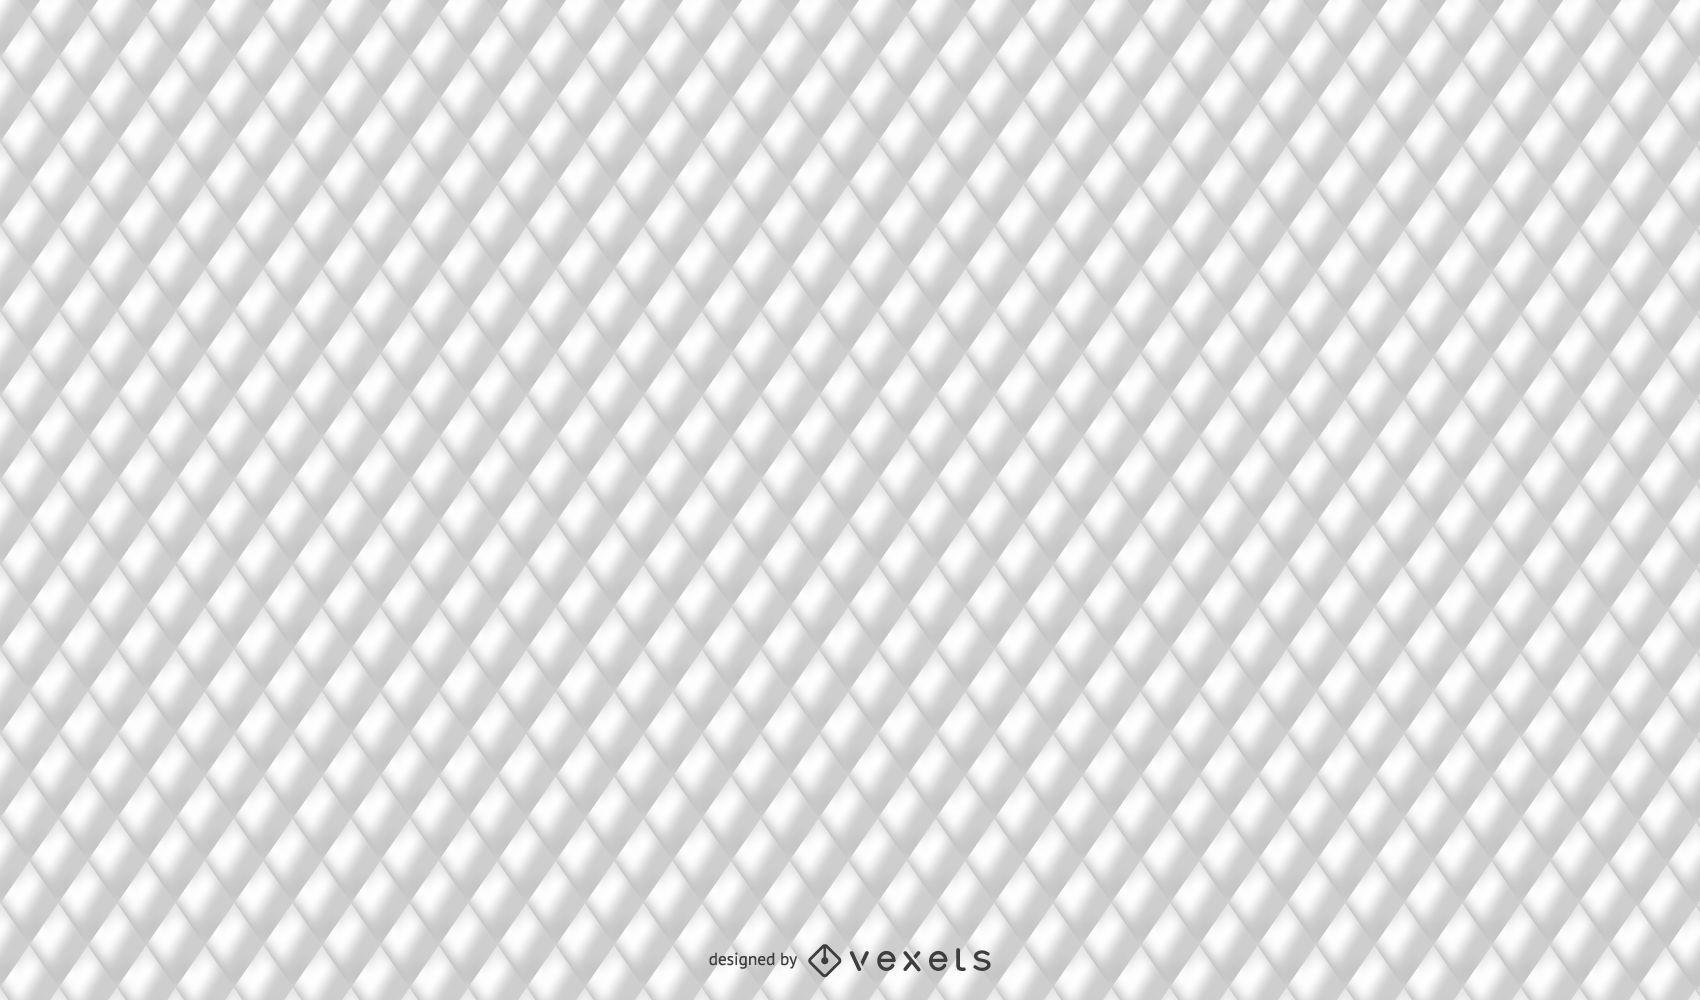 Textura acolchada blanca